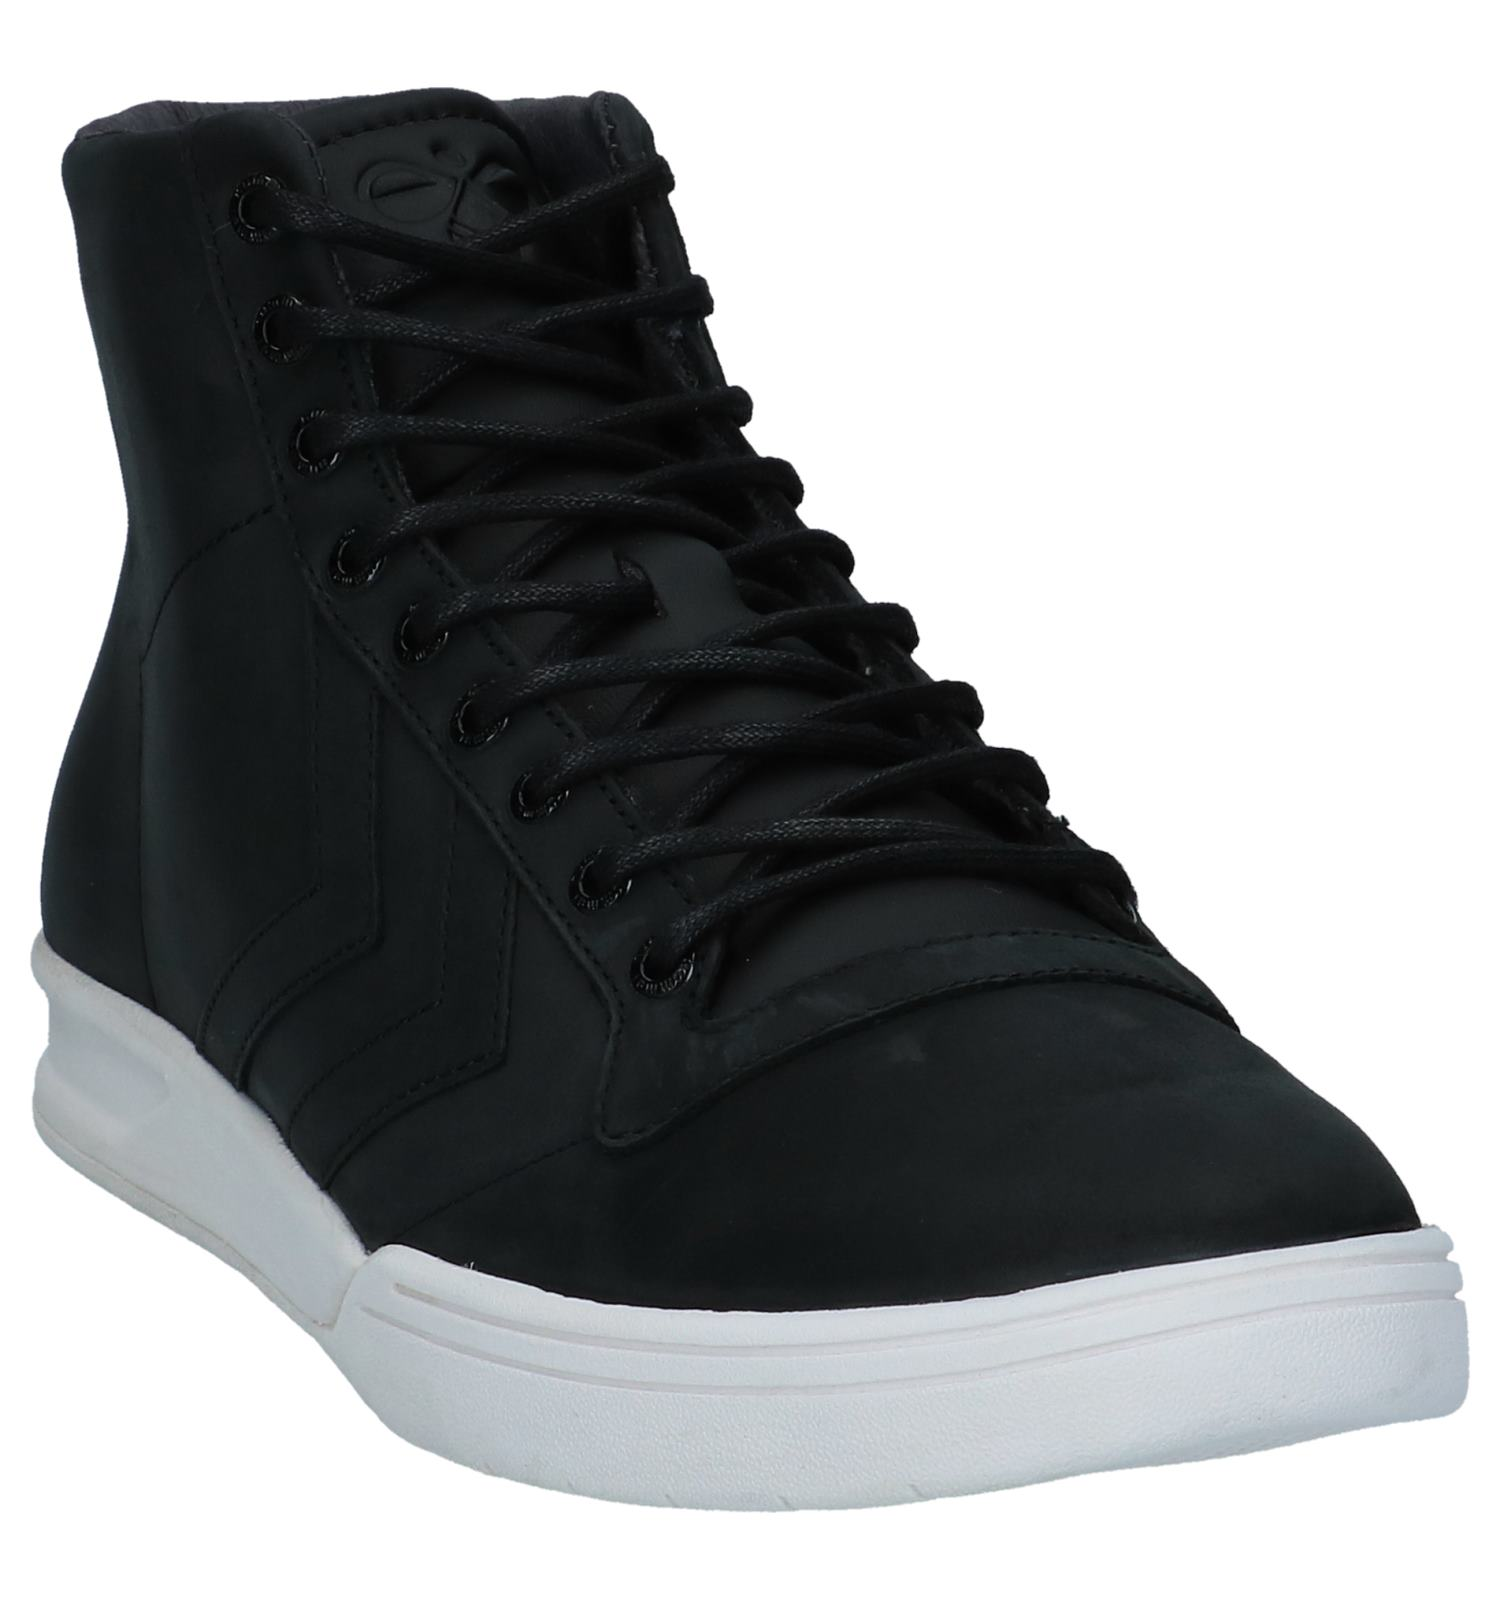 Hoge Sneakers Zwarte Zwarte Sneakers Hummel Hummel Hoge BodWQxrCe